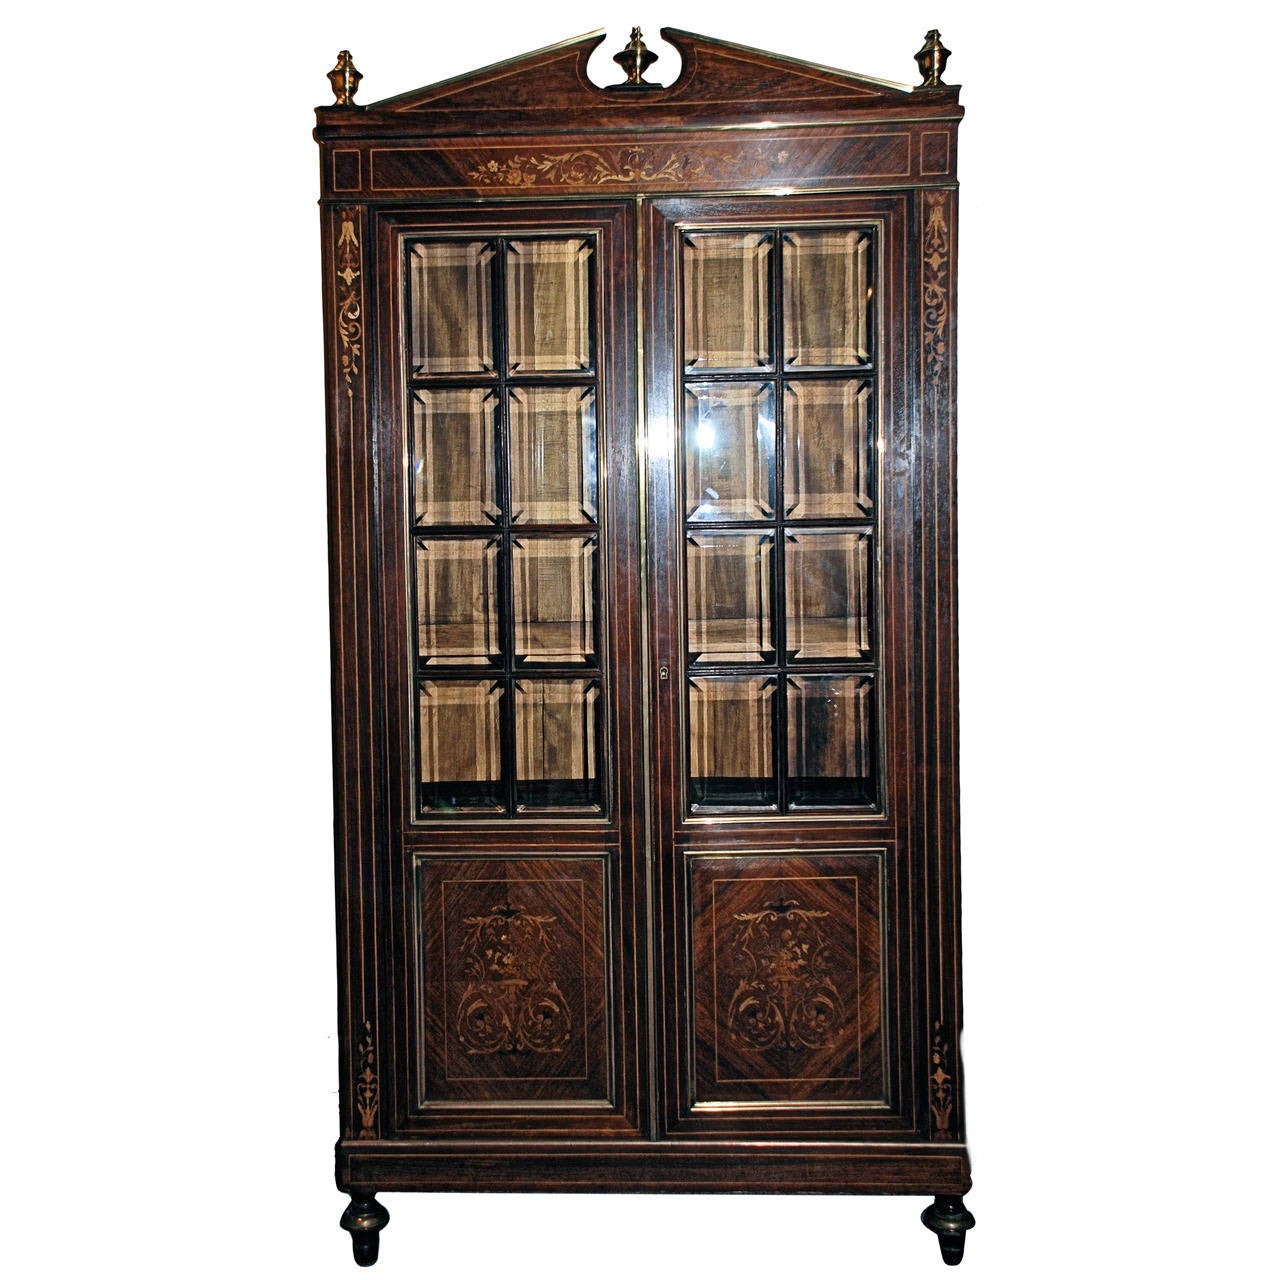 Antique vitrine cabinet at 1stdibs for Sideboard vitrine